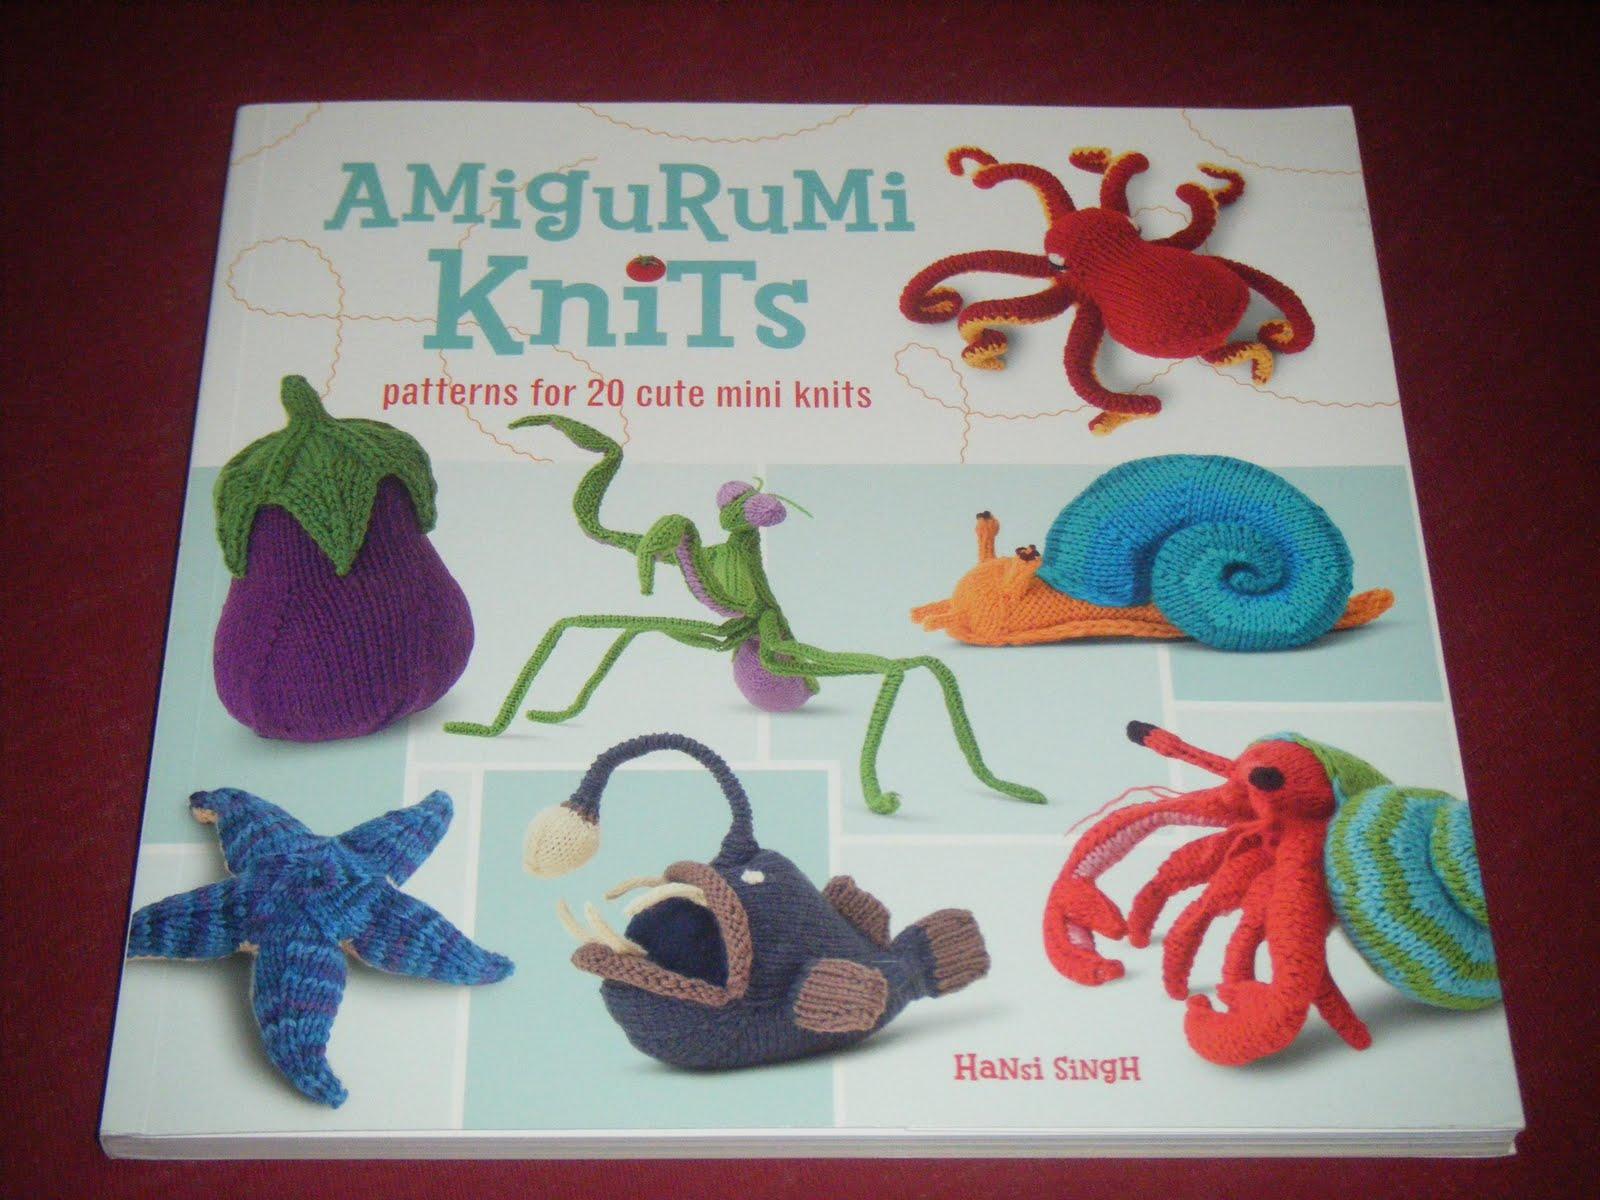 The glorious books!: Amigurumi Knits